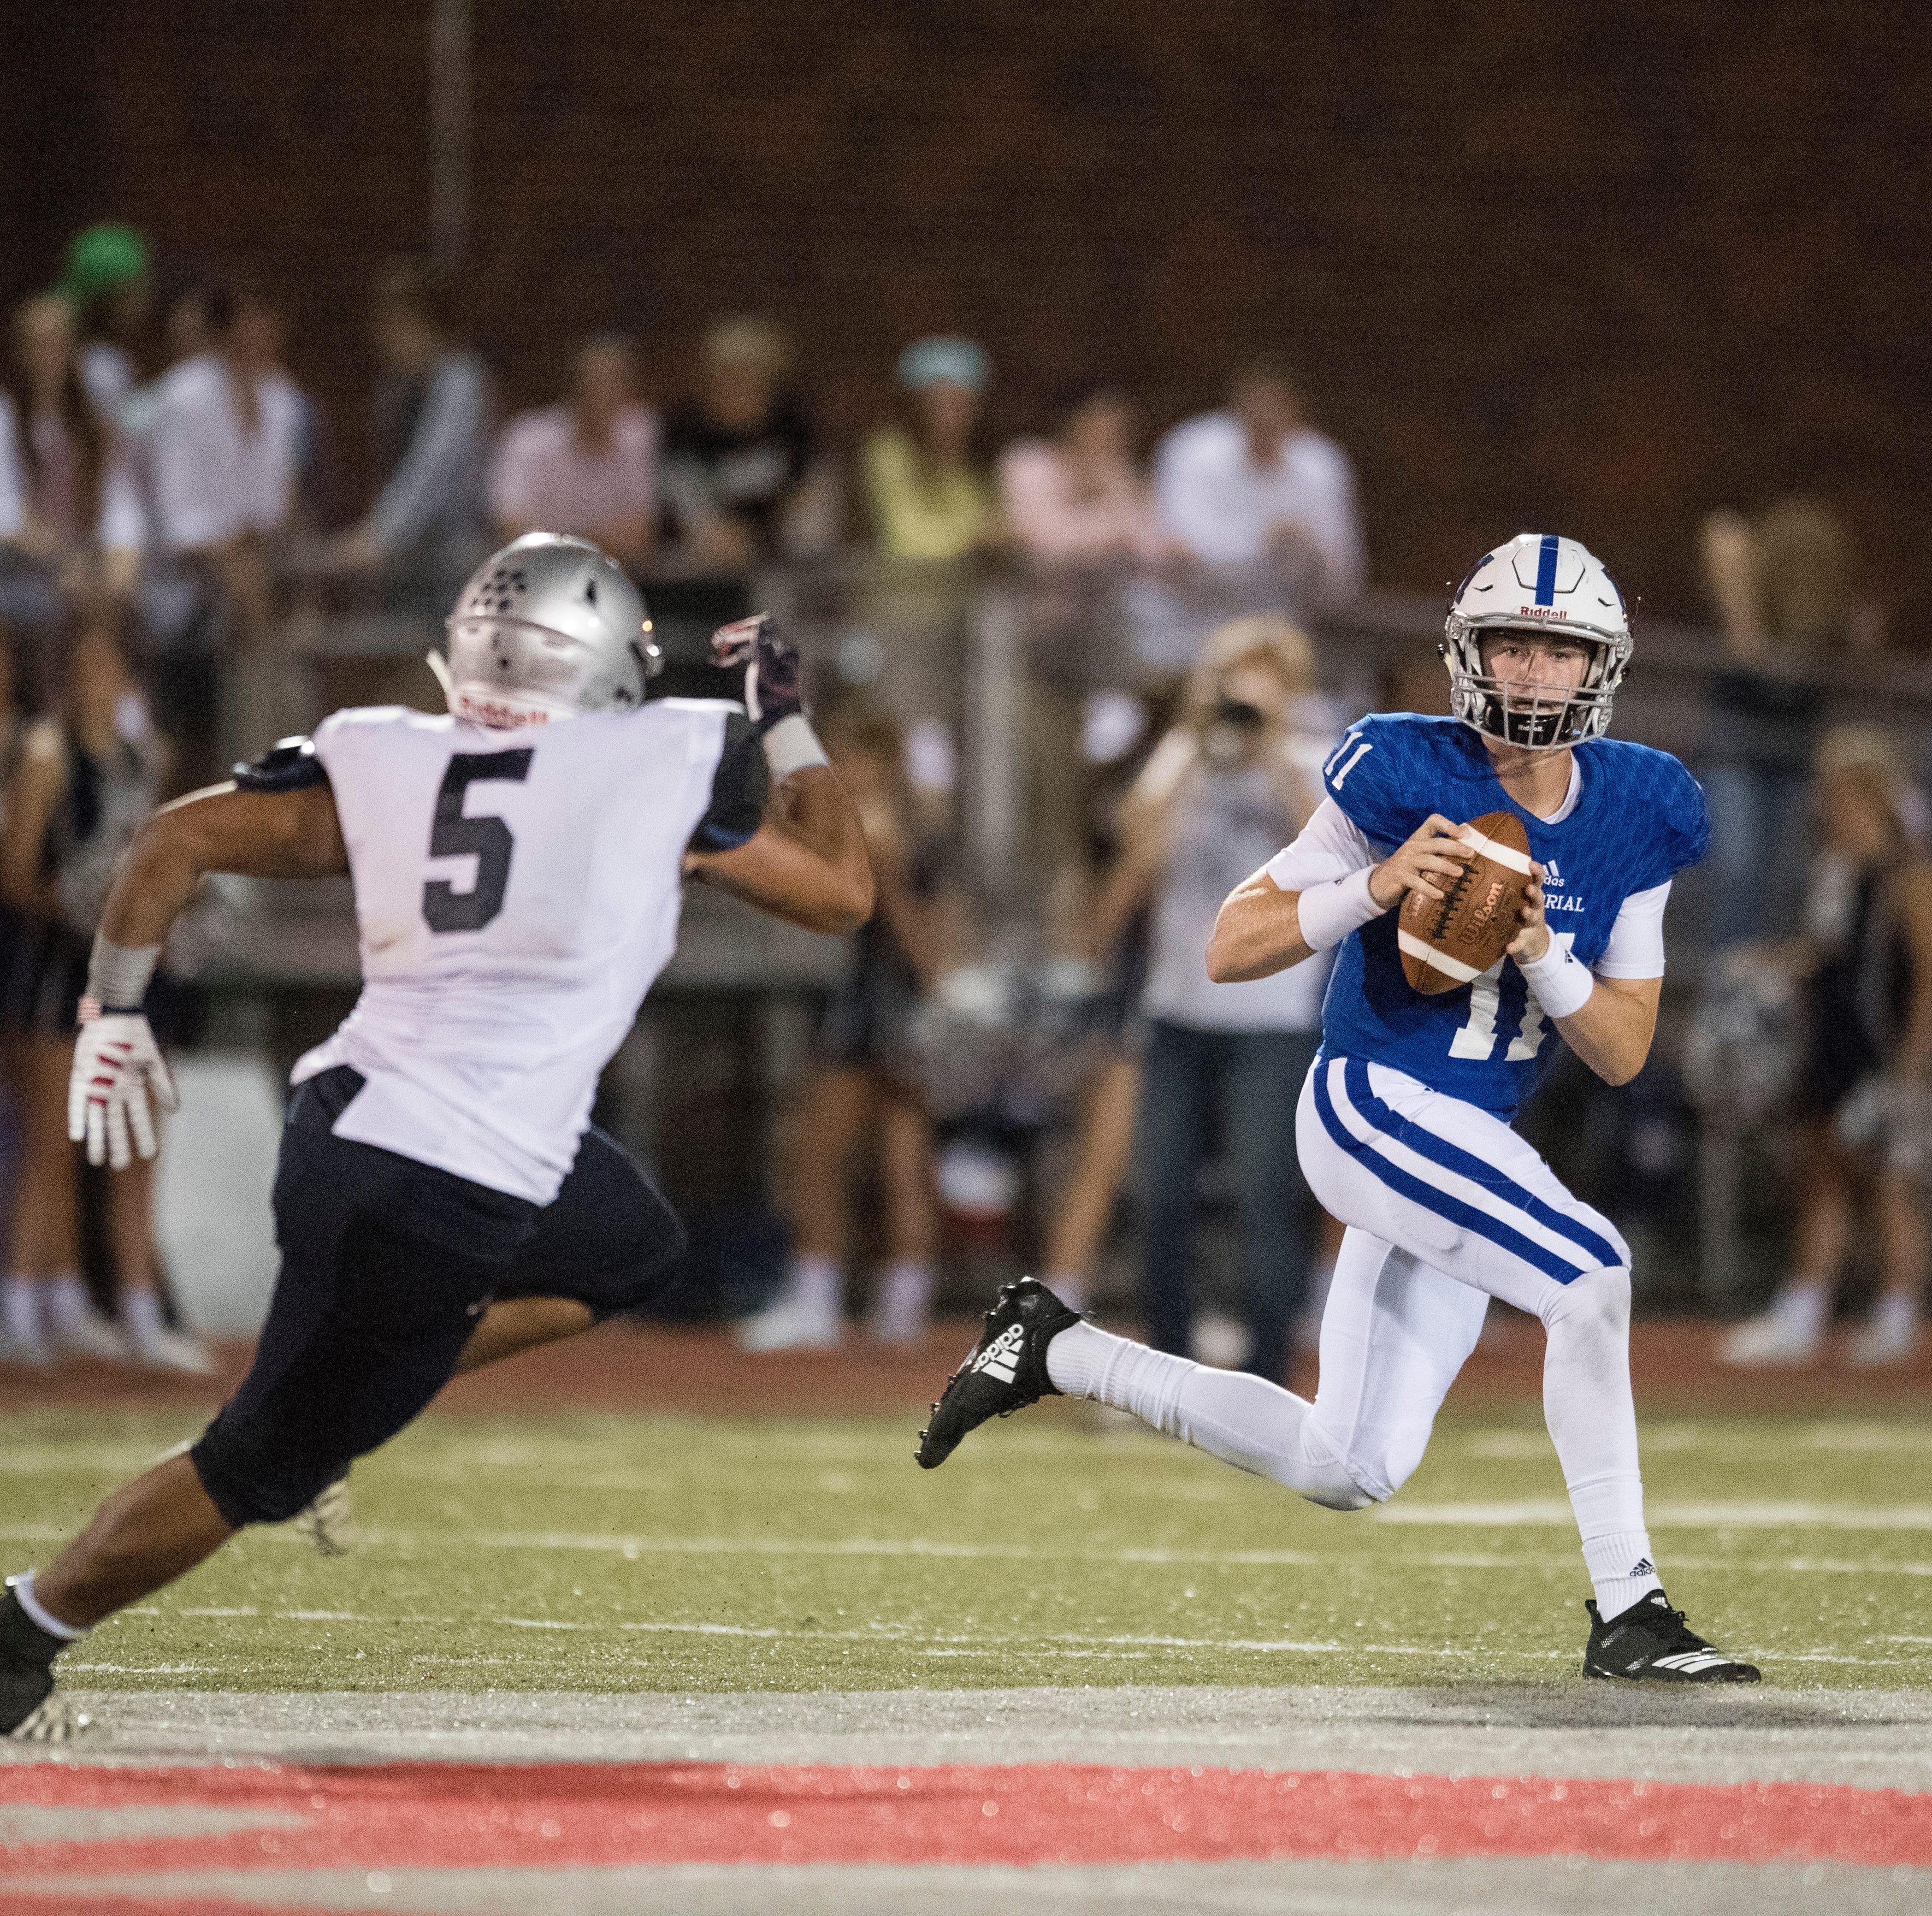 7 takeaways from Friday night's Week 6 high school football games